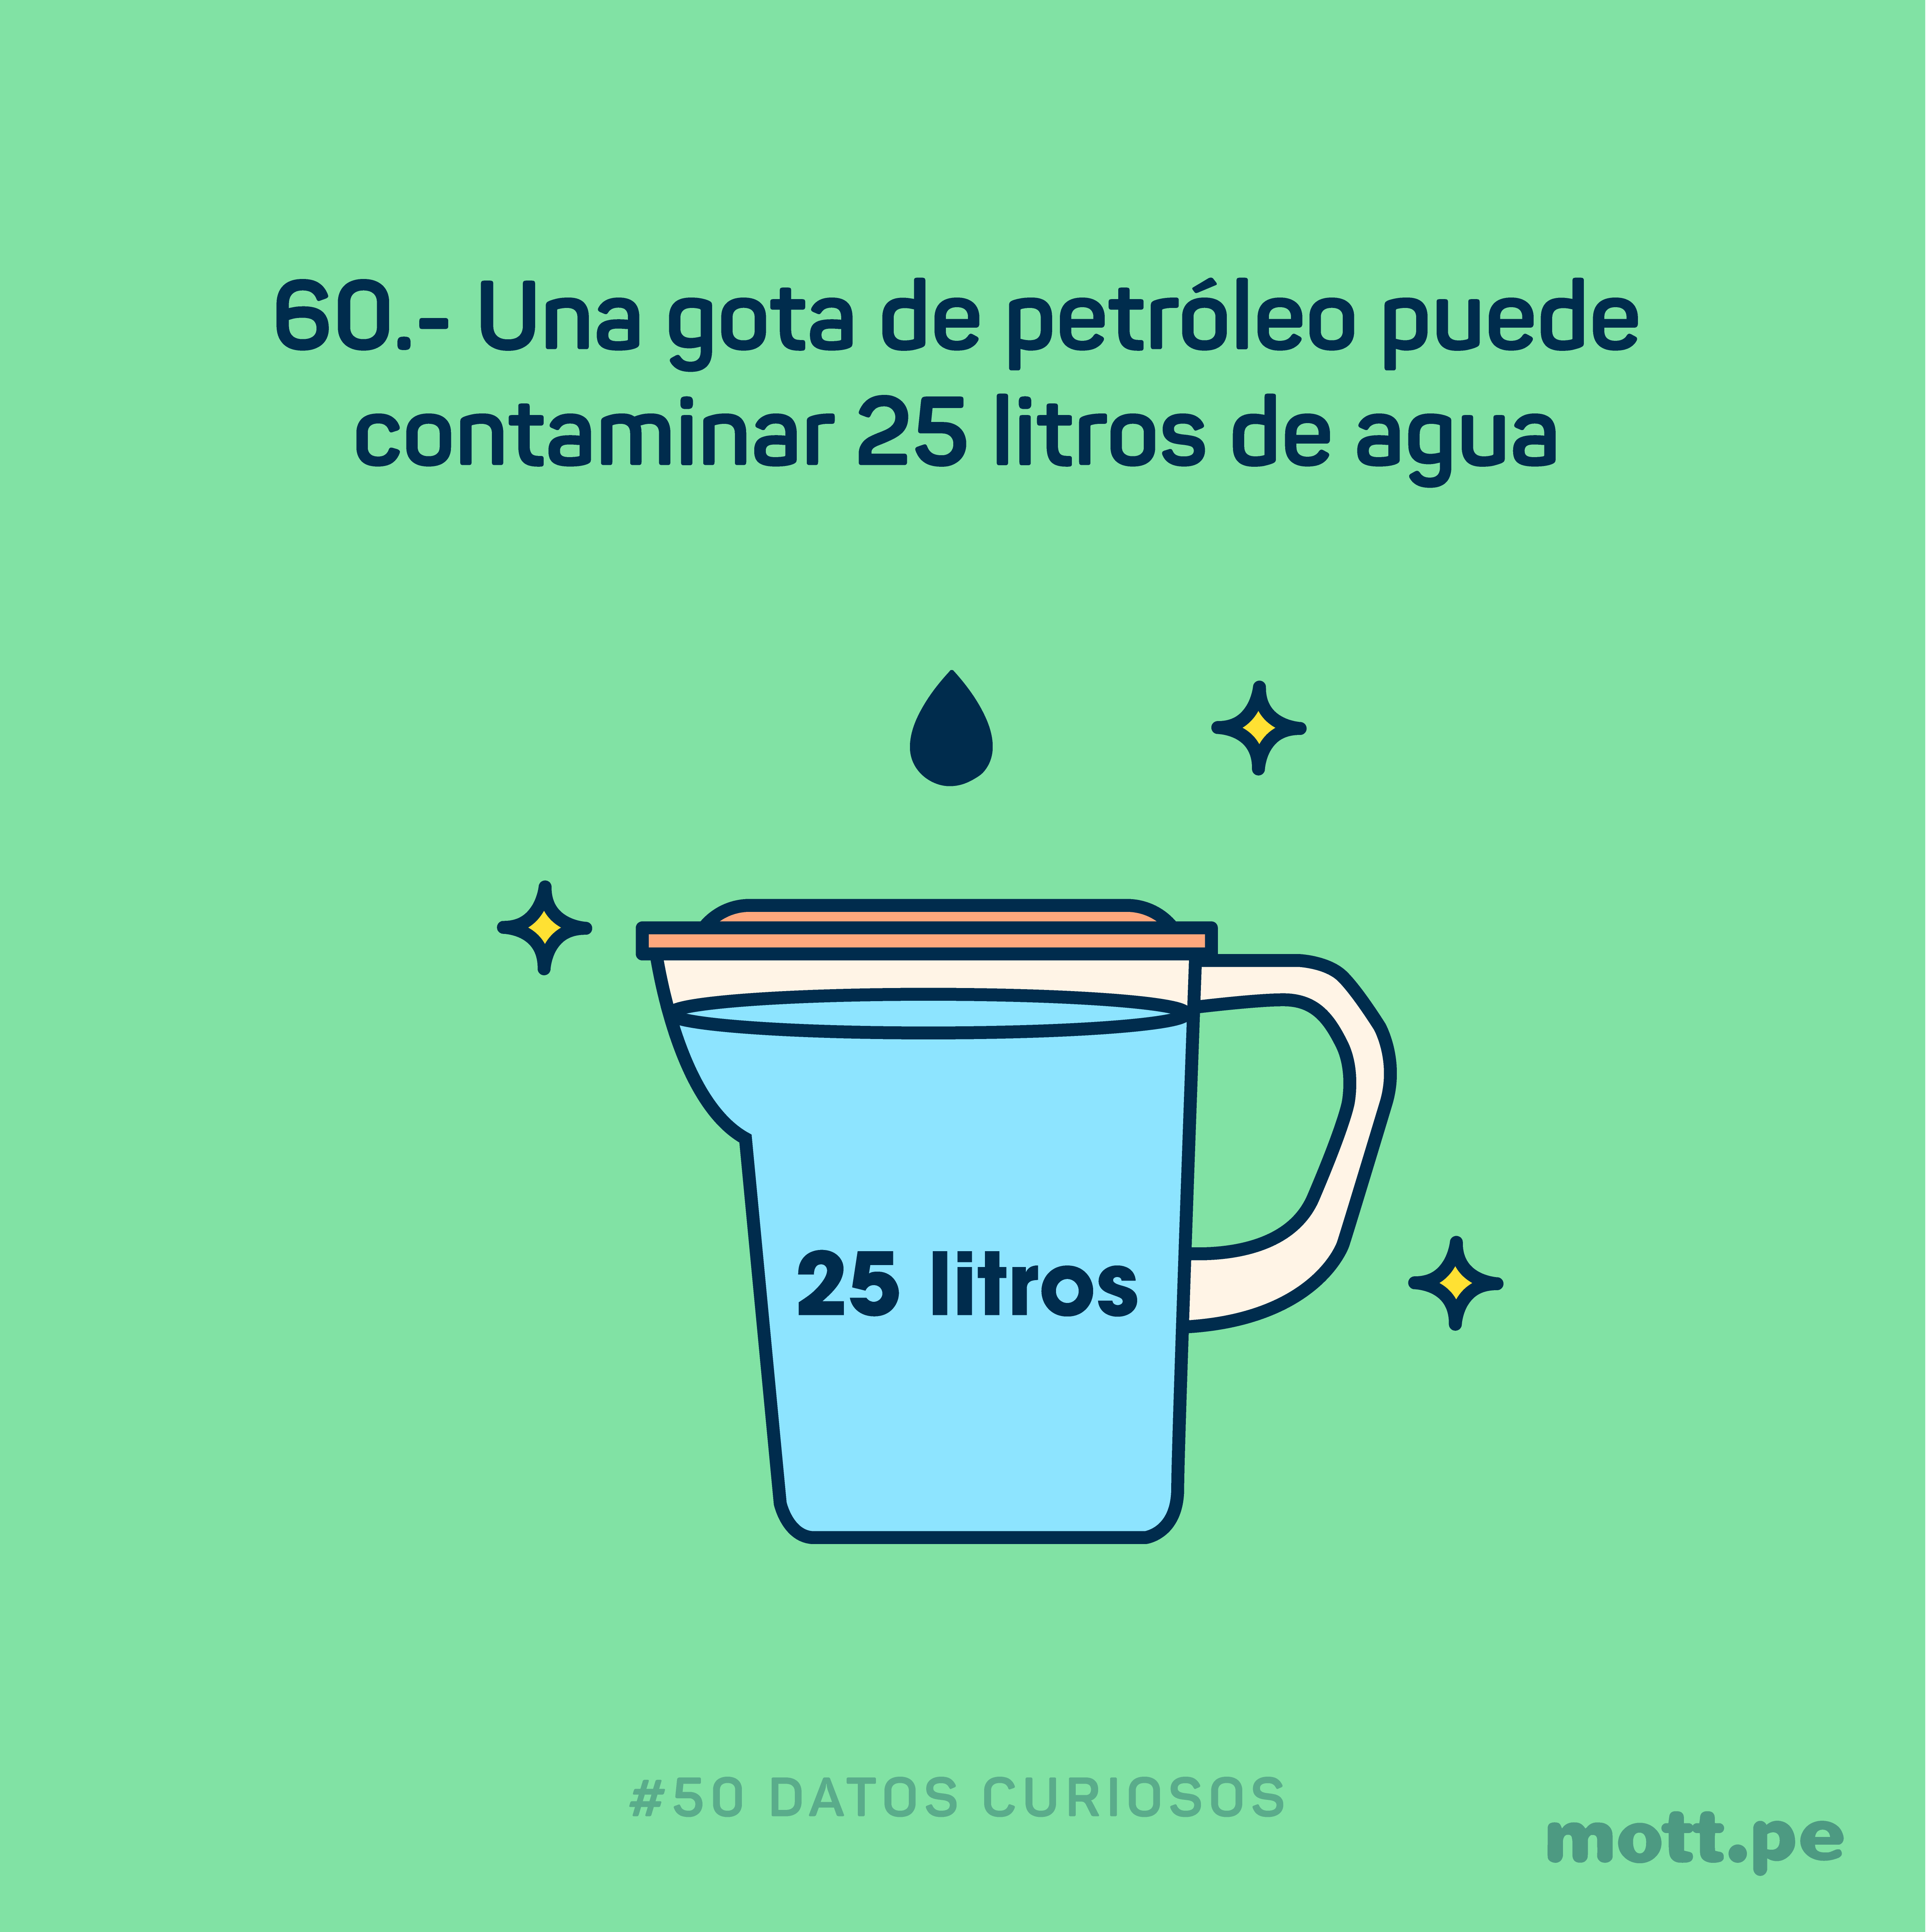 una sola gota de petróleo es capaz de contaminar irremediablemente 25 litros de agua